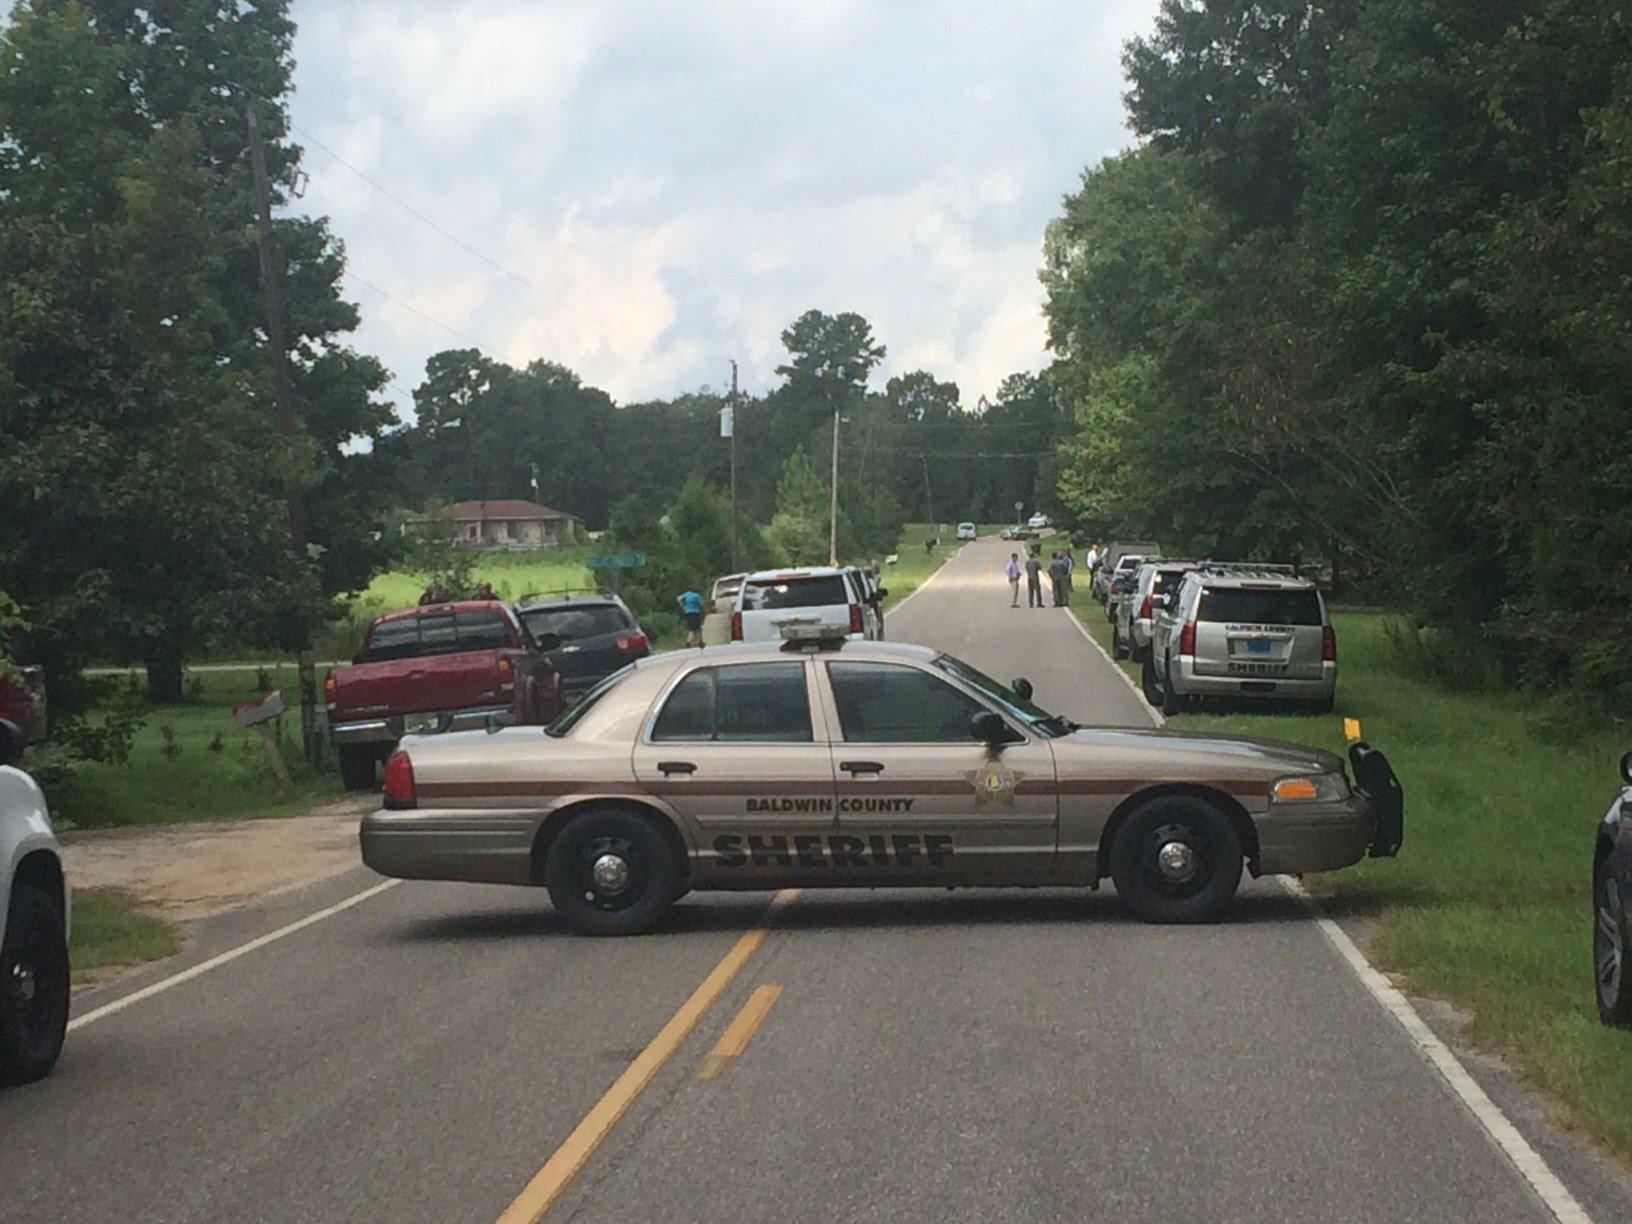 Baldwin County Sheriff's Office investigators on scene (Photo: Hal Scheurich, FOX10 News)